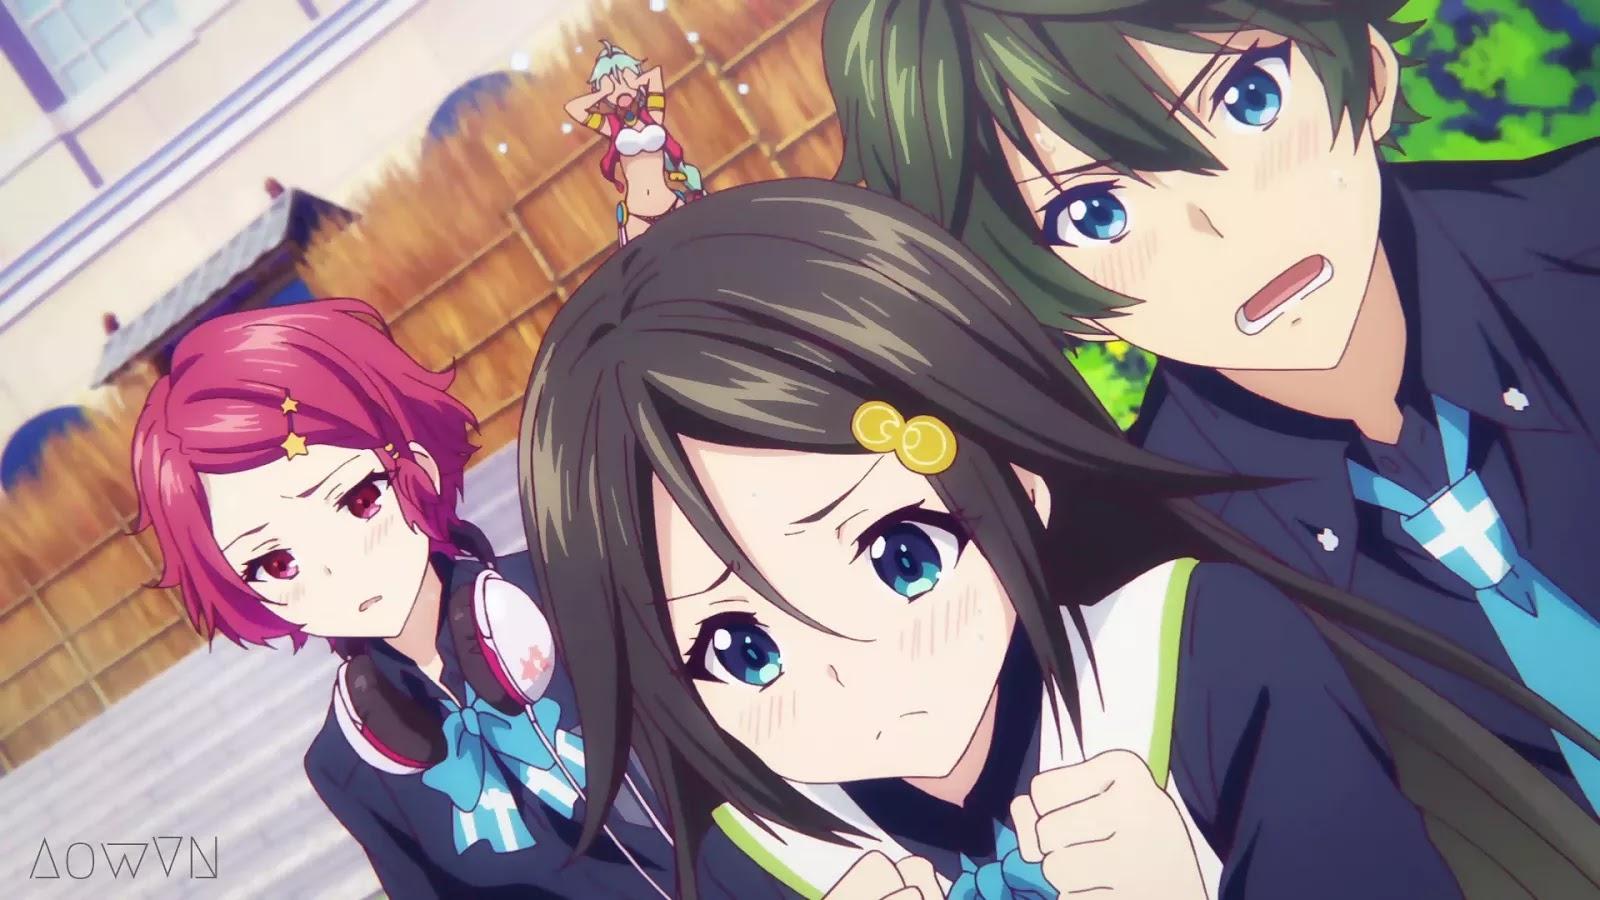 AowVN.org min%2B%25285%2529 - [ Anime 3gp Mp4 ] Musaigen no Phantom World + OVA BD | Vietsub - Ecchi Harem Art Cực Đẹp + Tặng Poster